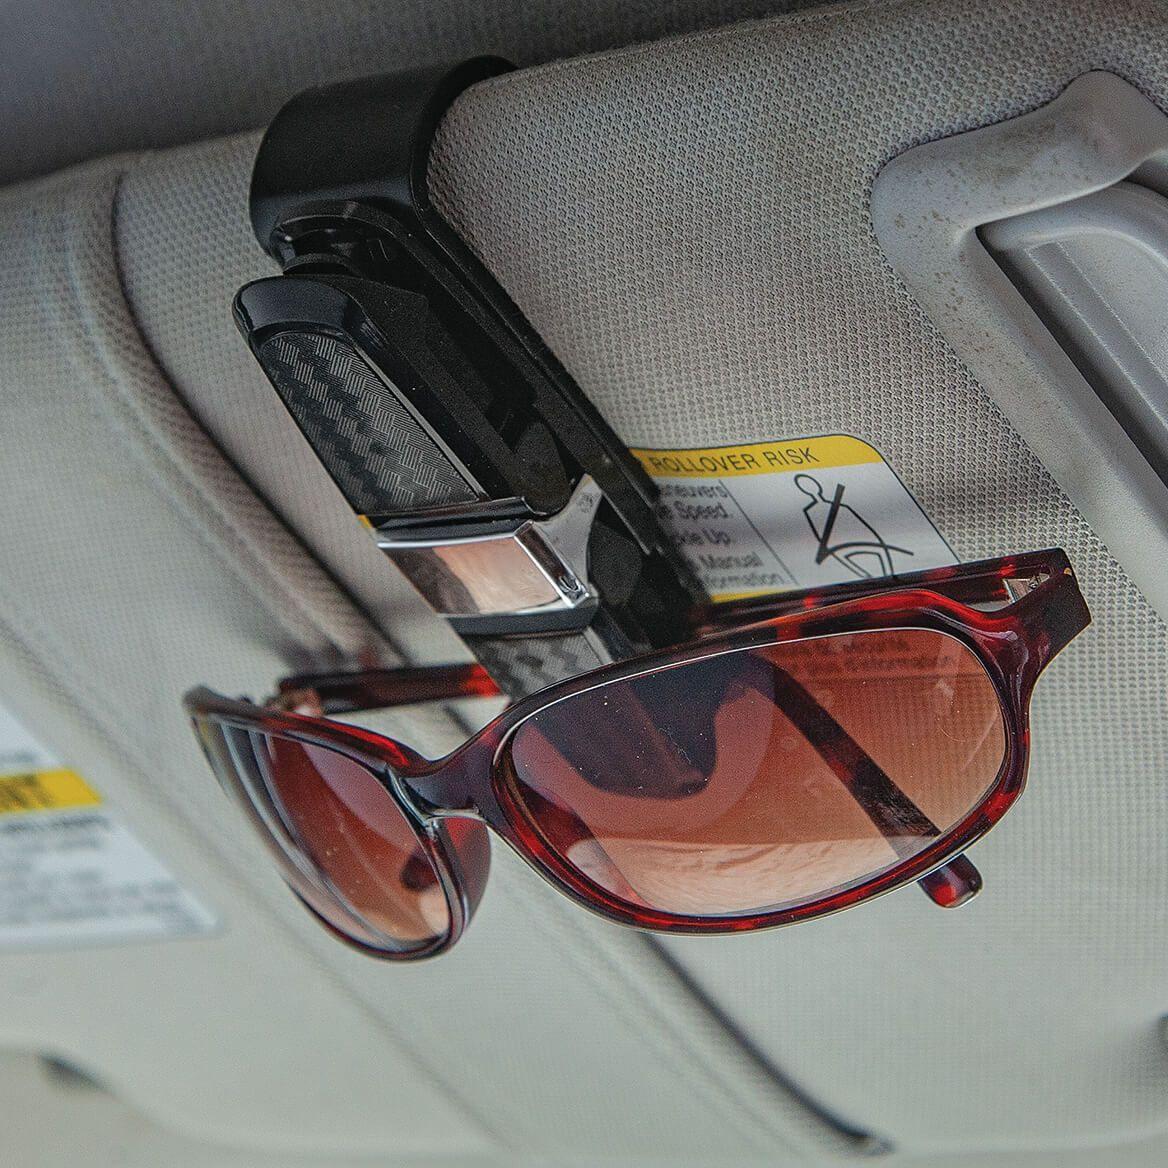 Double Sunglasses Visor Clip-371721